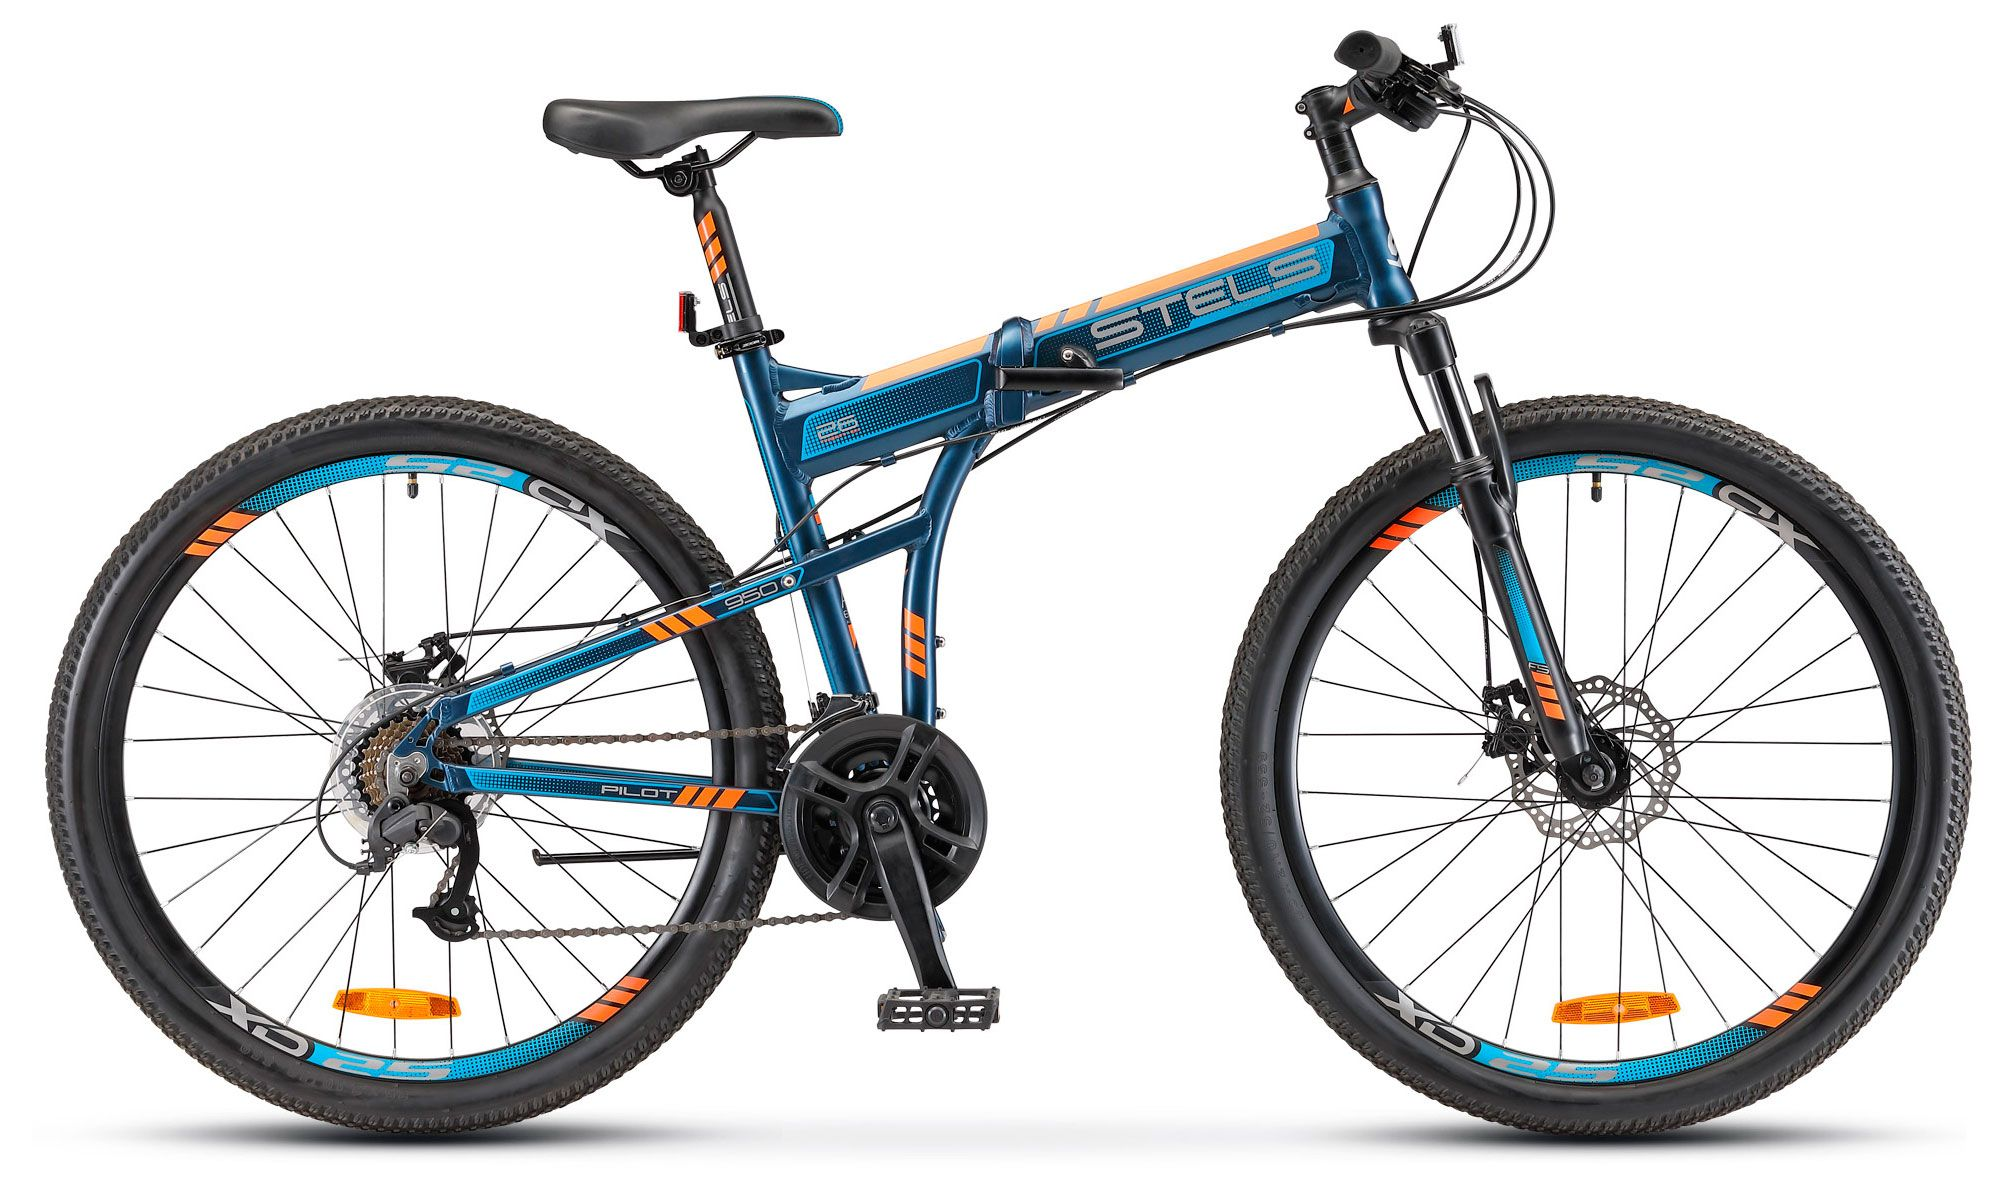 Велосипед Stels Pilot 950 MD 26 (V010) 2018